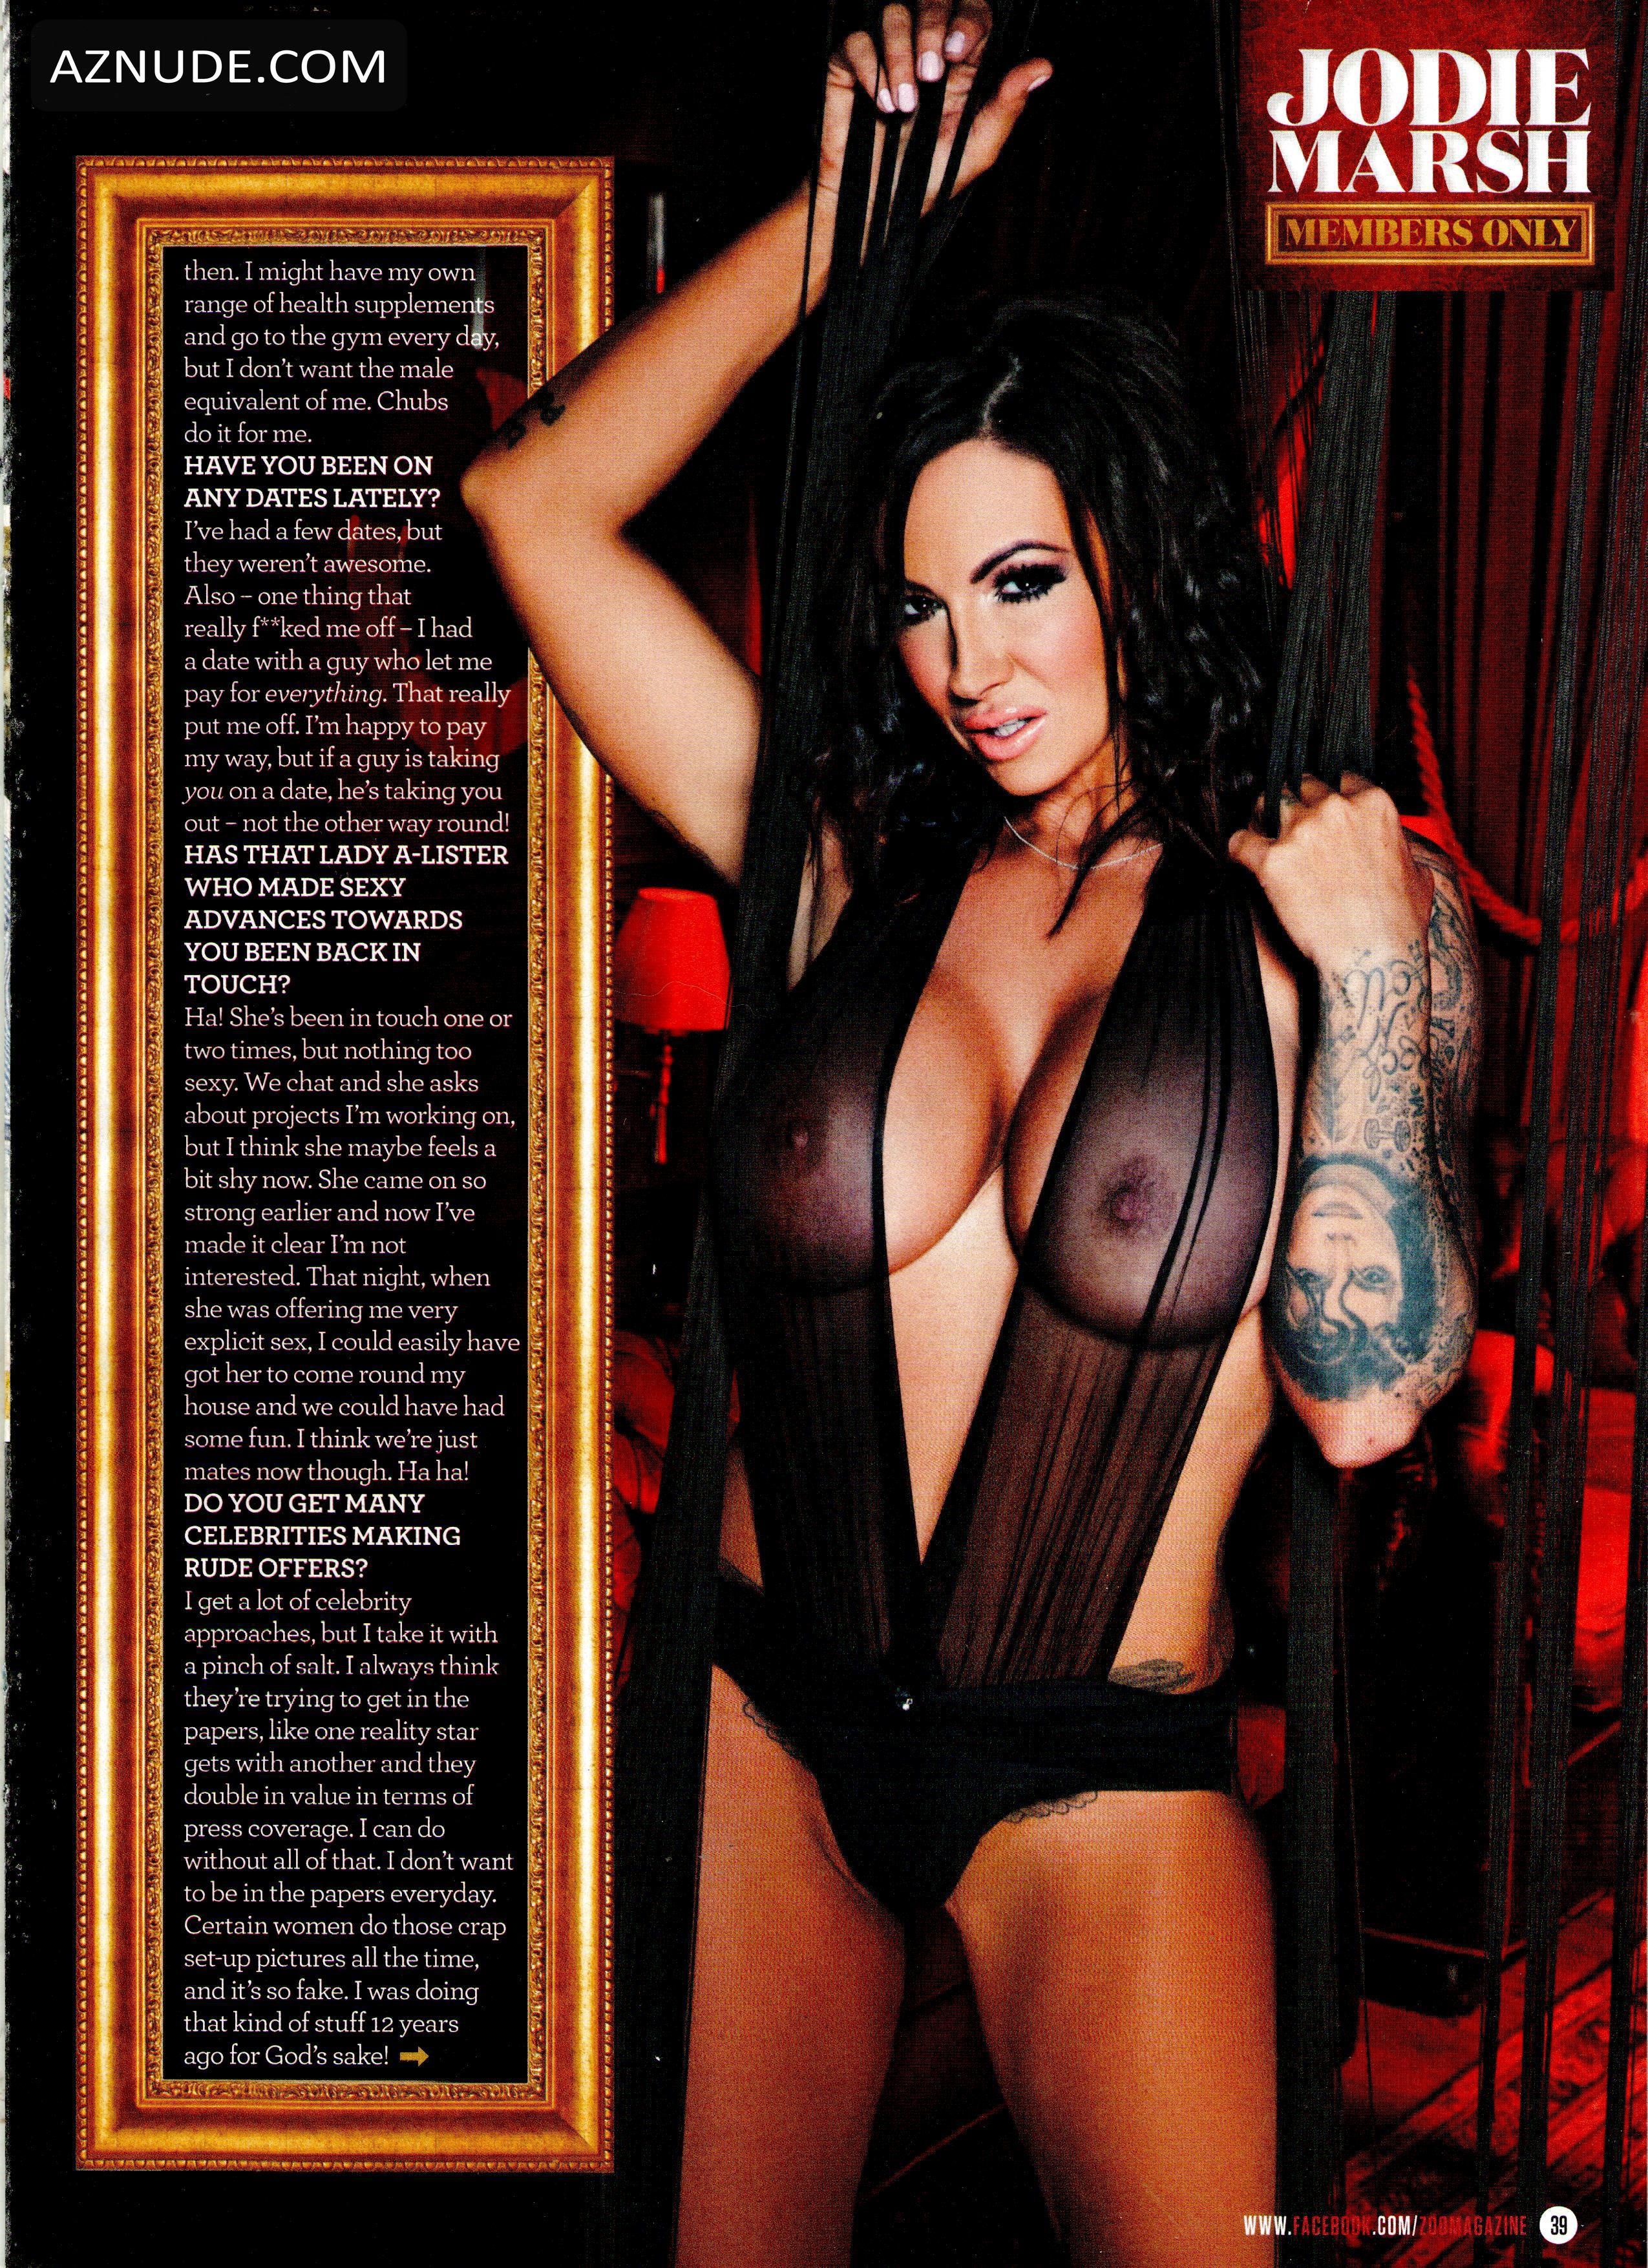 Jodie Marsh Topless Pics